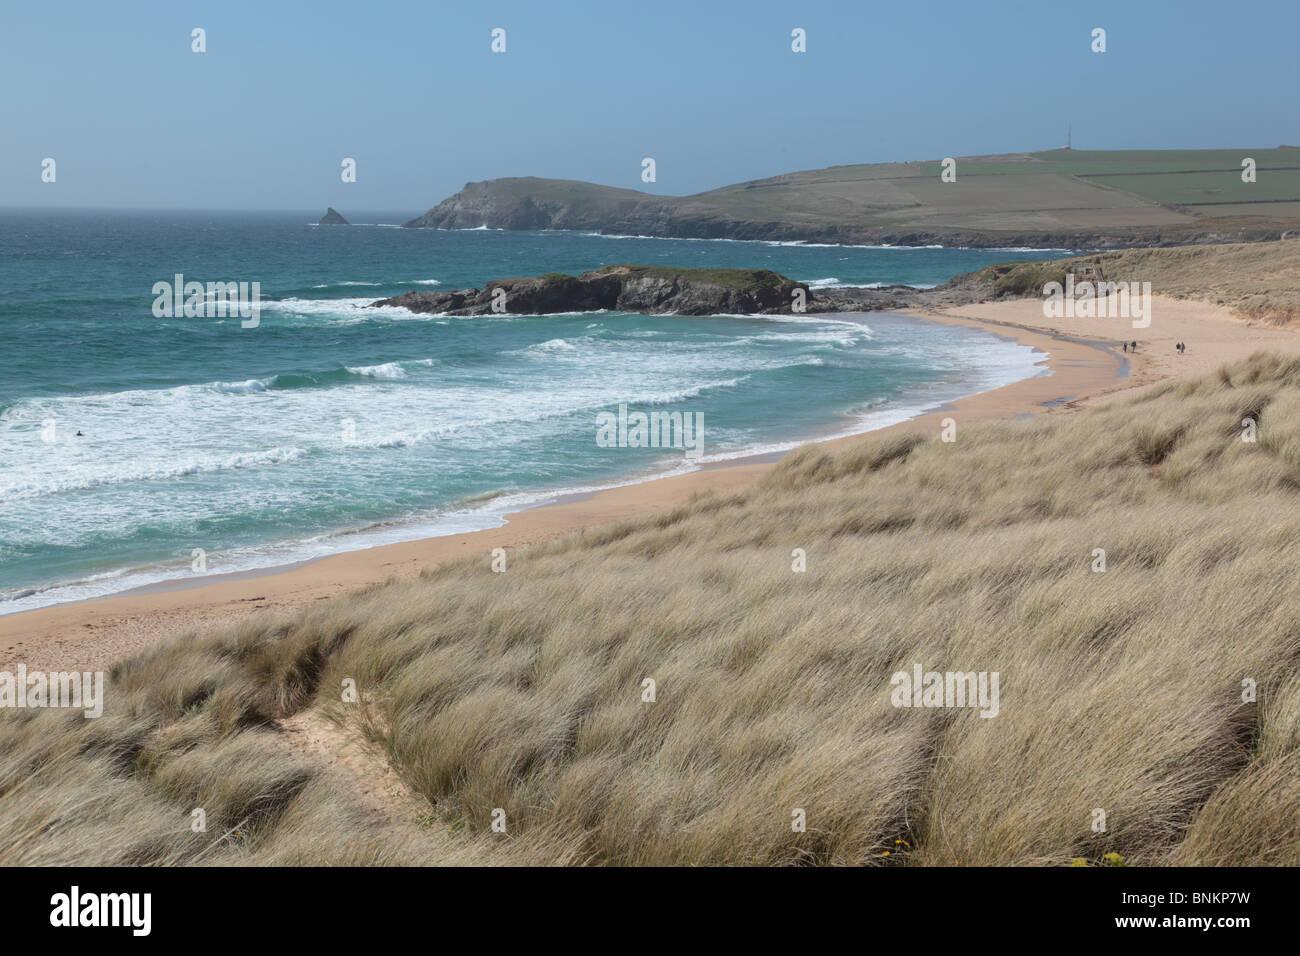 White balance daylight 5200K; Constantine Bay; Cornwall - Stock Image